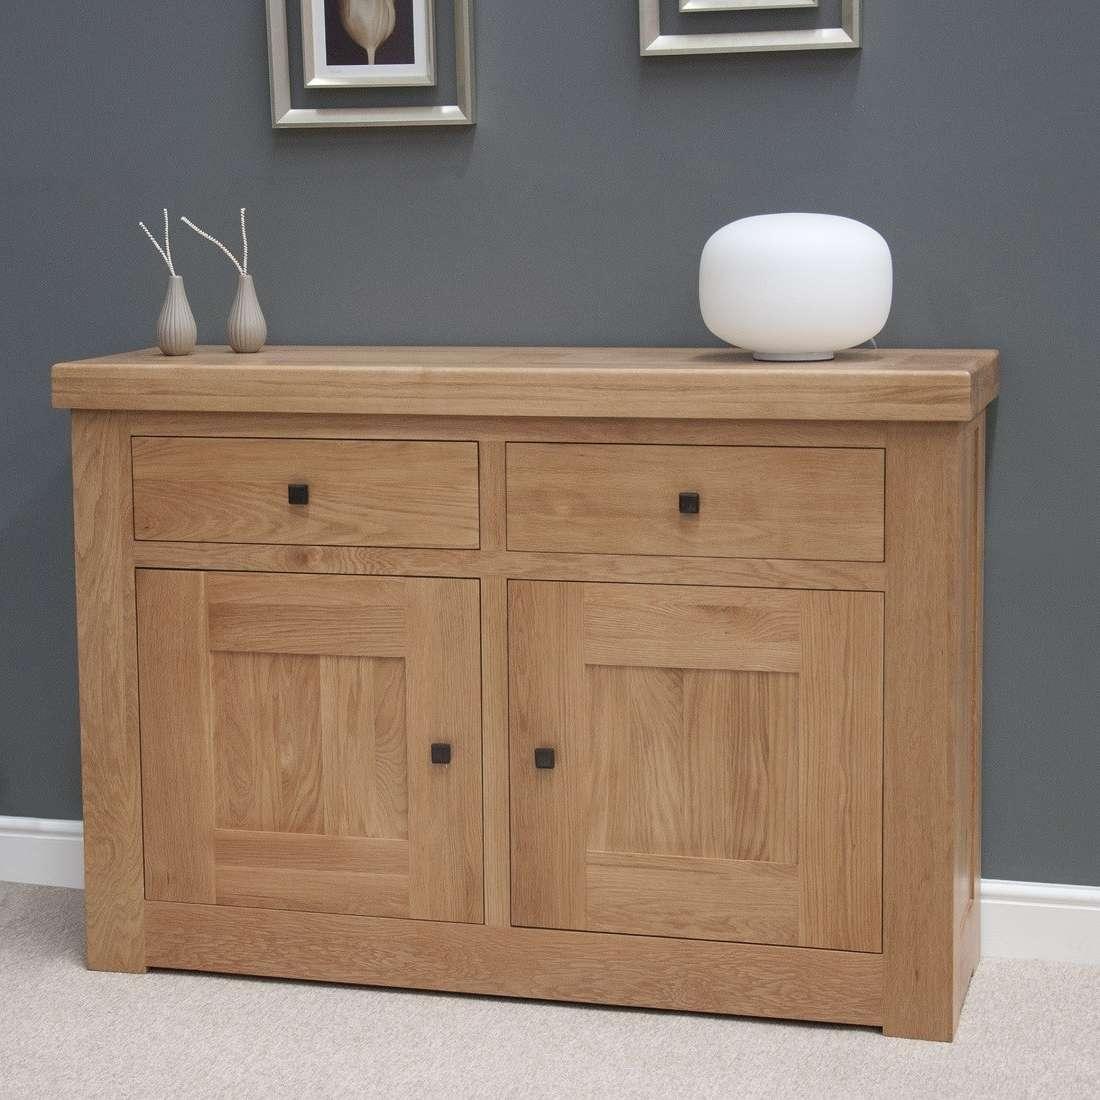 French Bordeaux Oak Small 2 Door Sideboard | Oak Furniture Uk Inside 2 Door Sideboards (View 8 of 20)